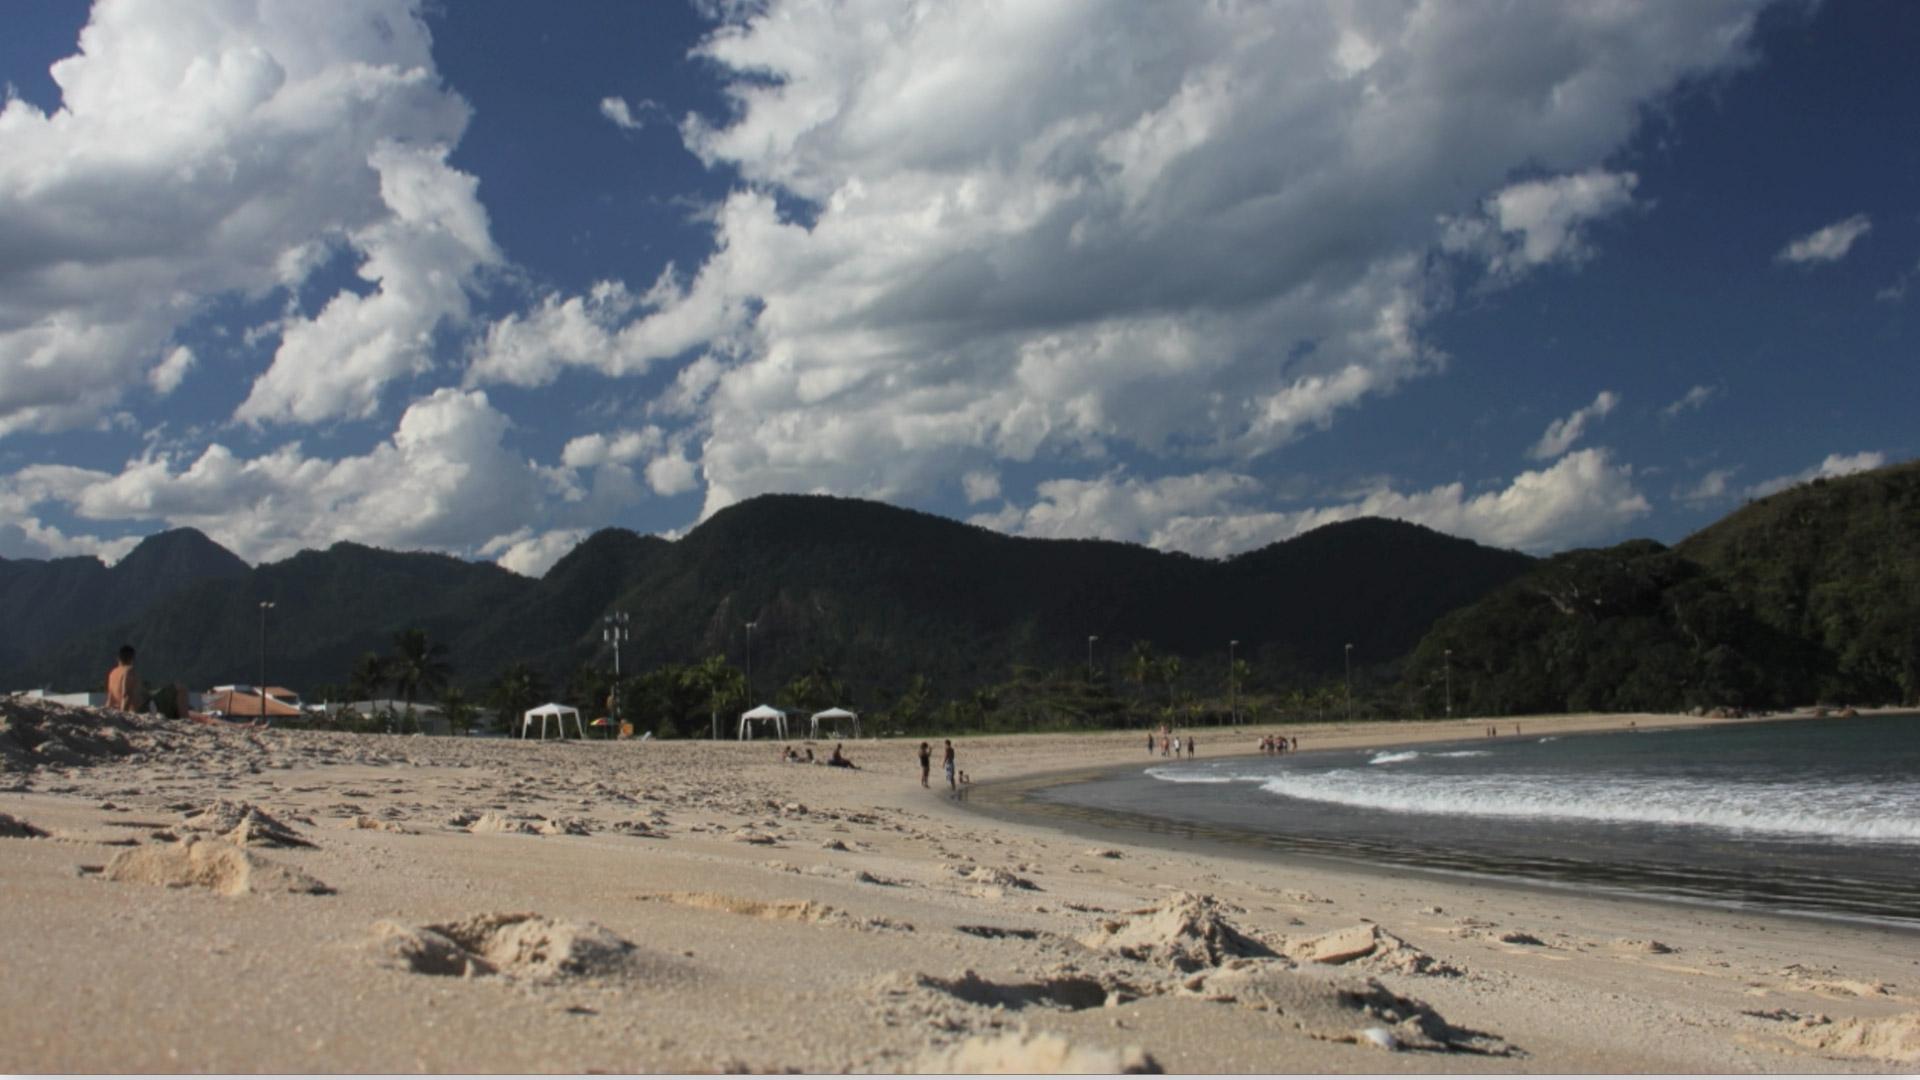 Praia da Cocanha Time Lapse Video Cover